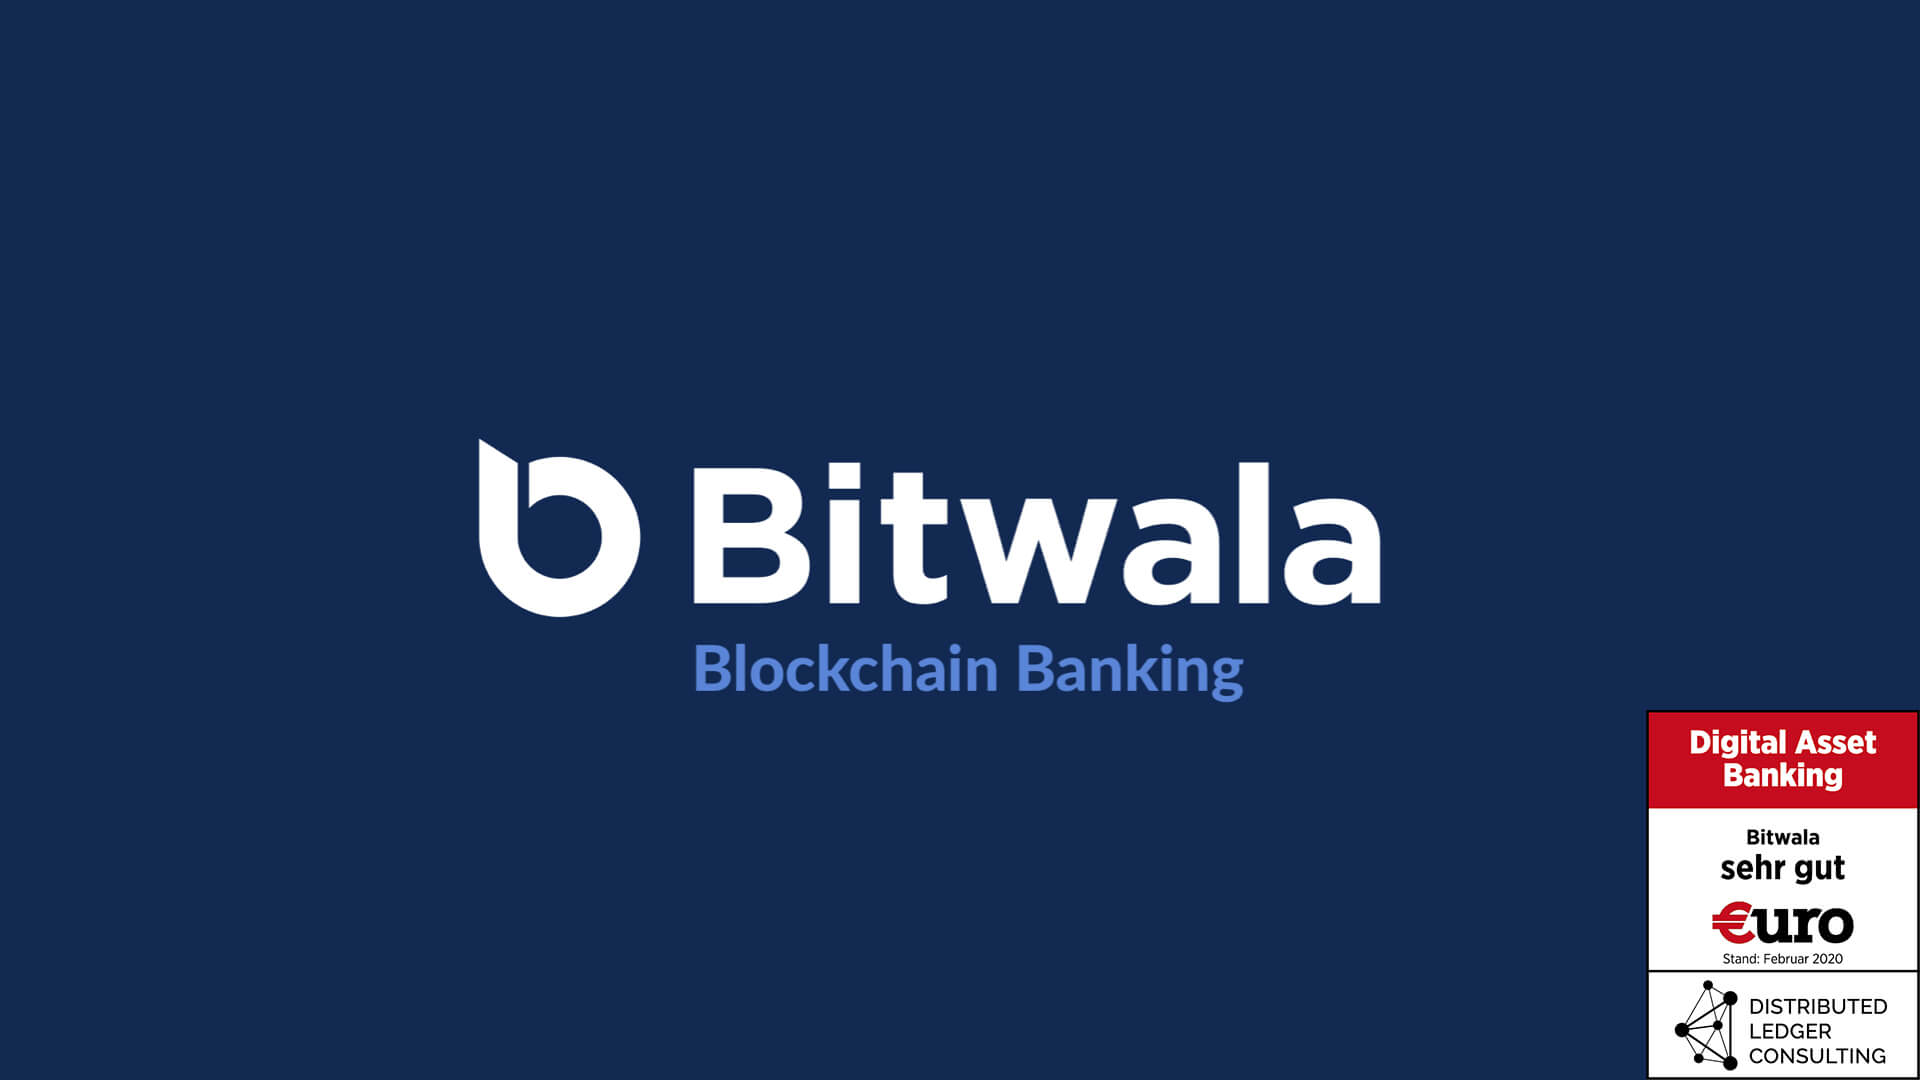 Bitwala Twitter